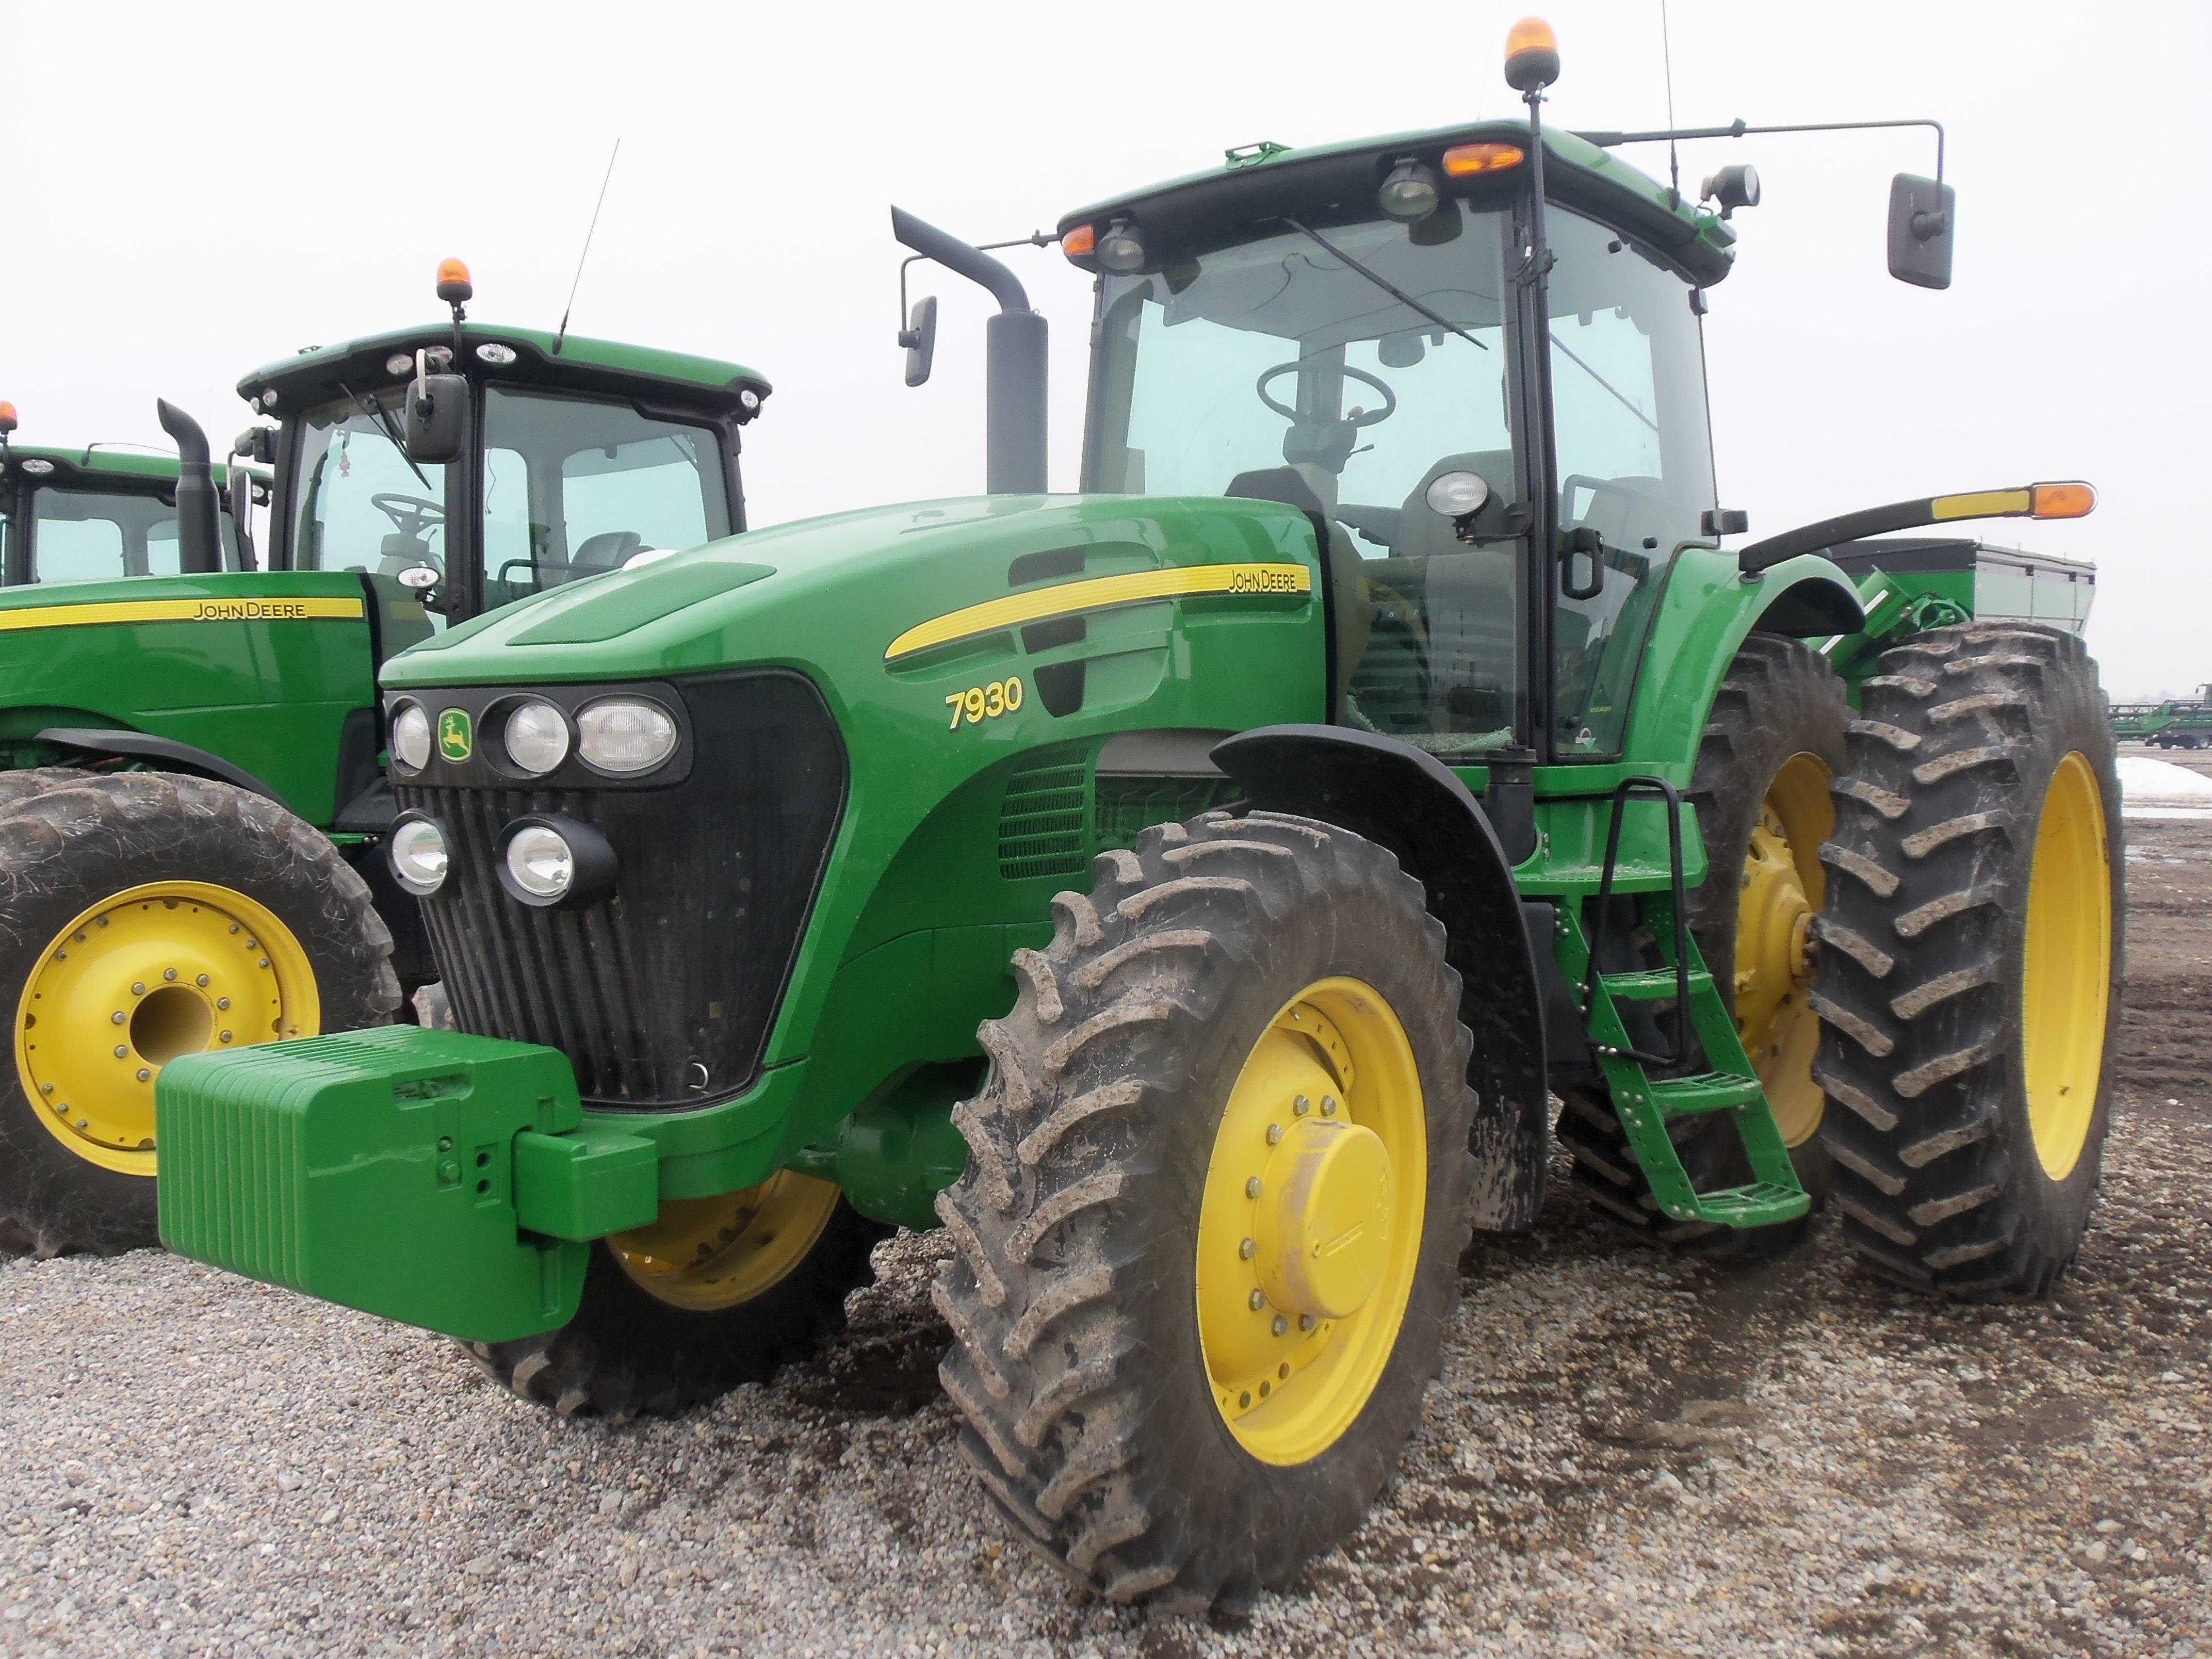 Traktor Ausmalbilder John Deere Genial Ausmalbilder Traktor Genial Kostenlose Ausmalbilder Bilder Zum Stock